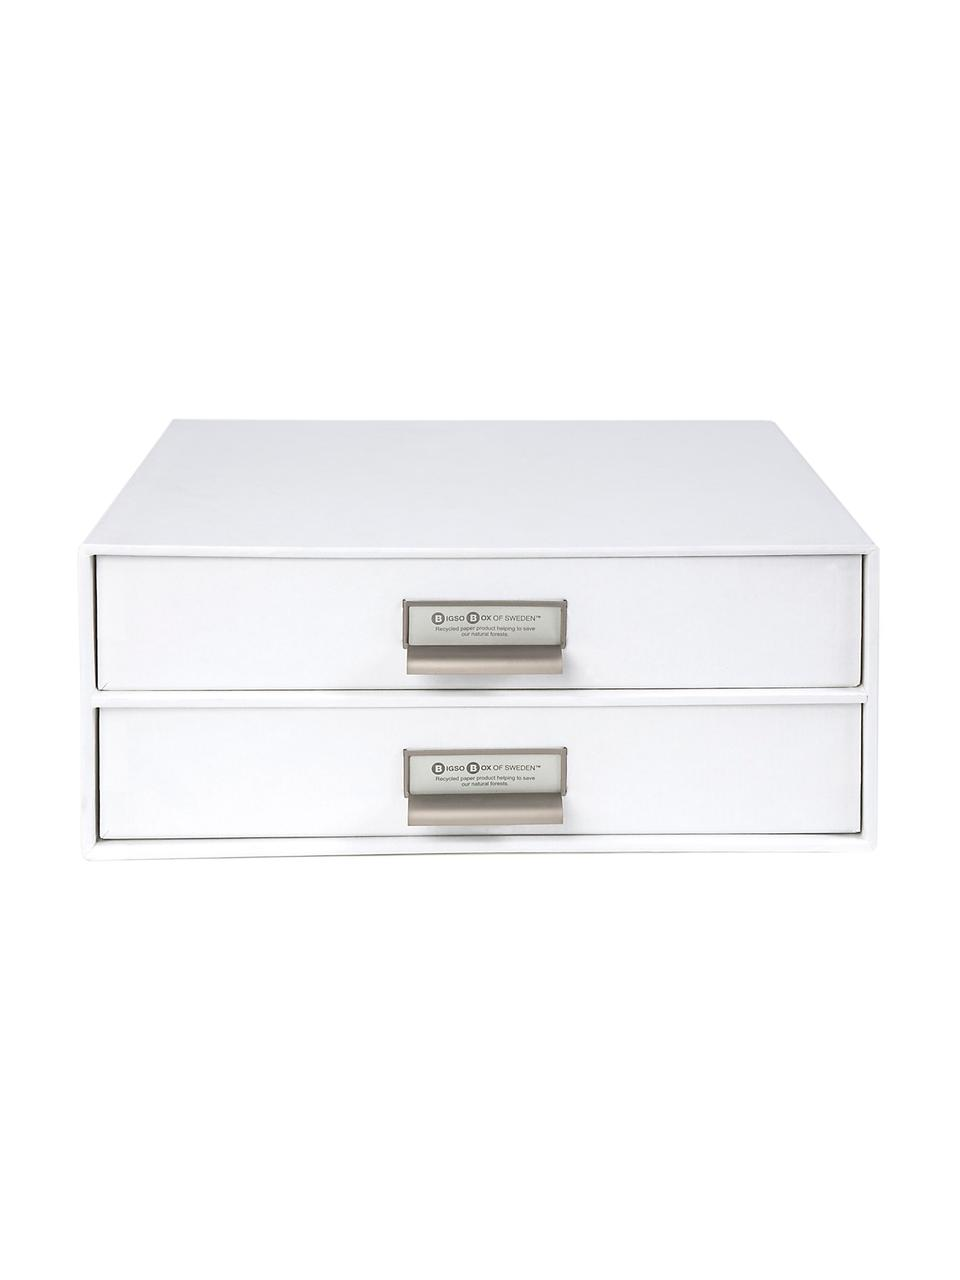 Büro-Organizer Birger, Organizer: Fester, laminierter Karto, Organizer außen: Weiß Organizer innen: Weiß, 33 x 15 cm